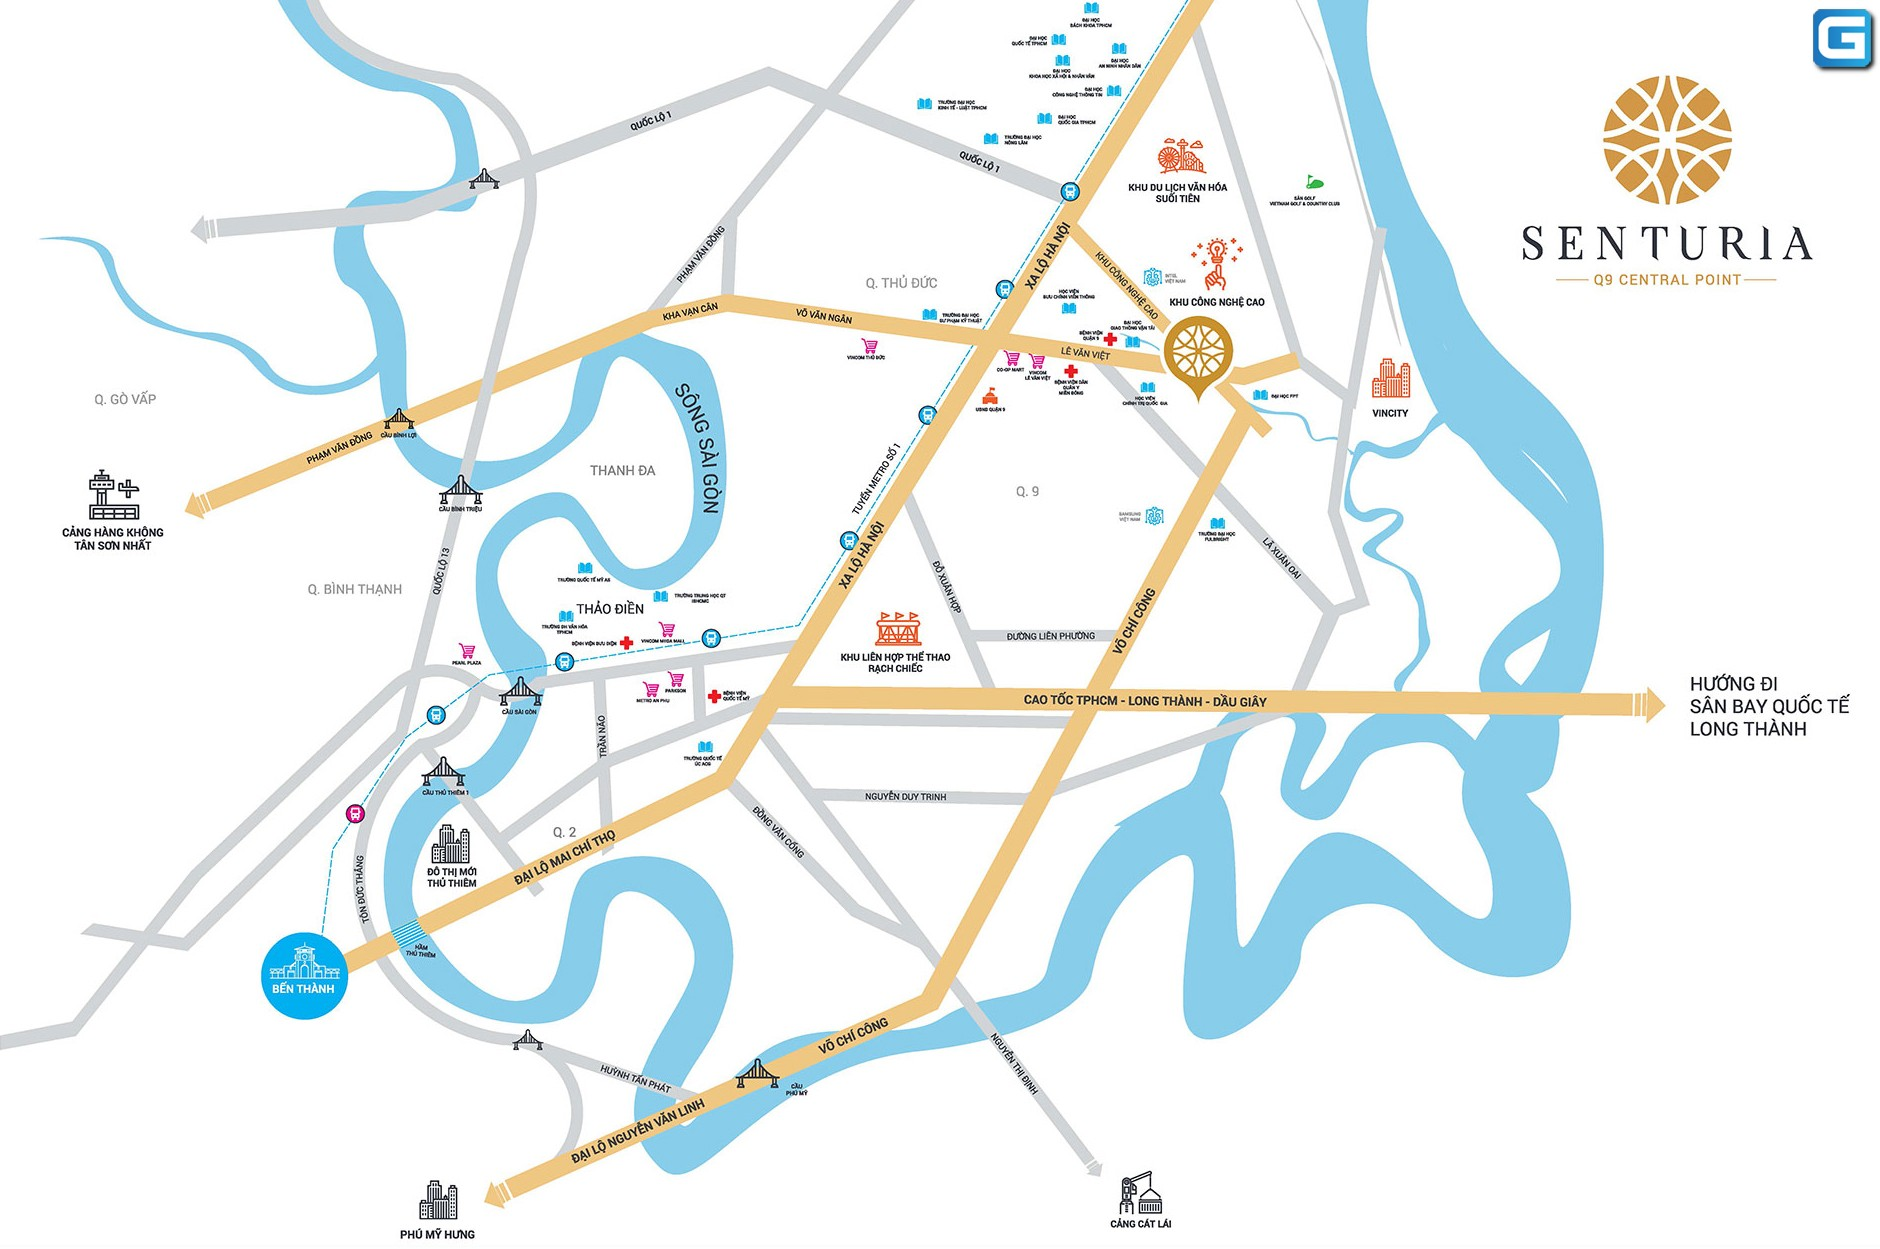 Senturia Q9 Central Point